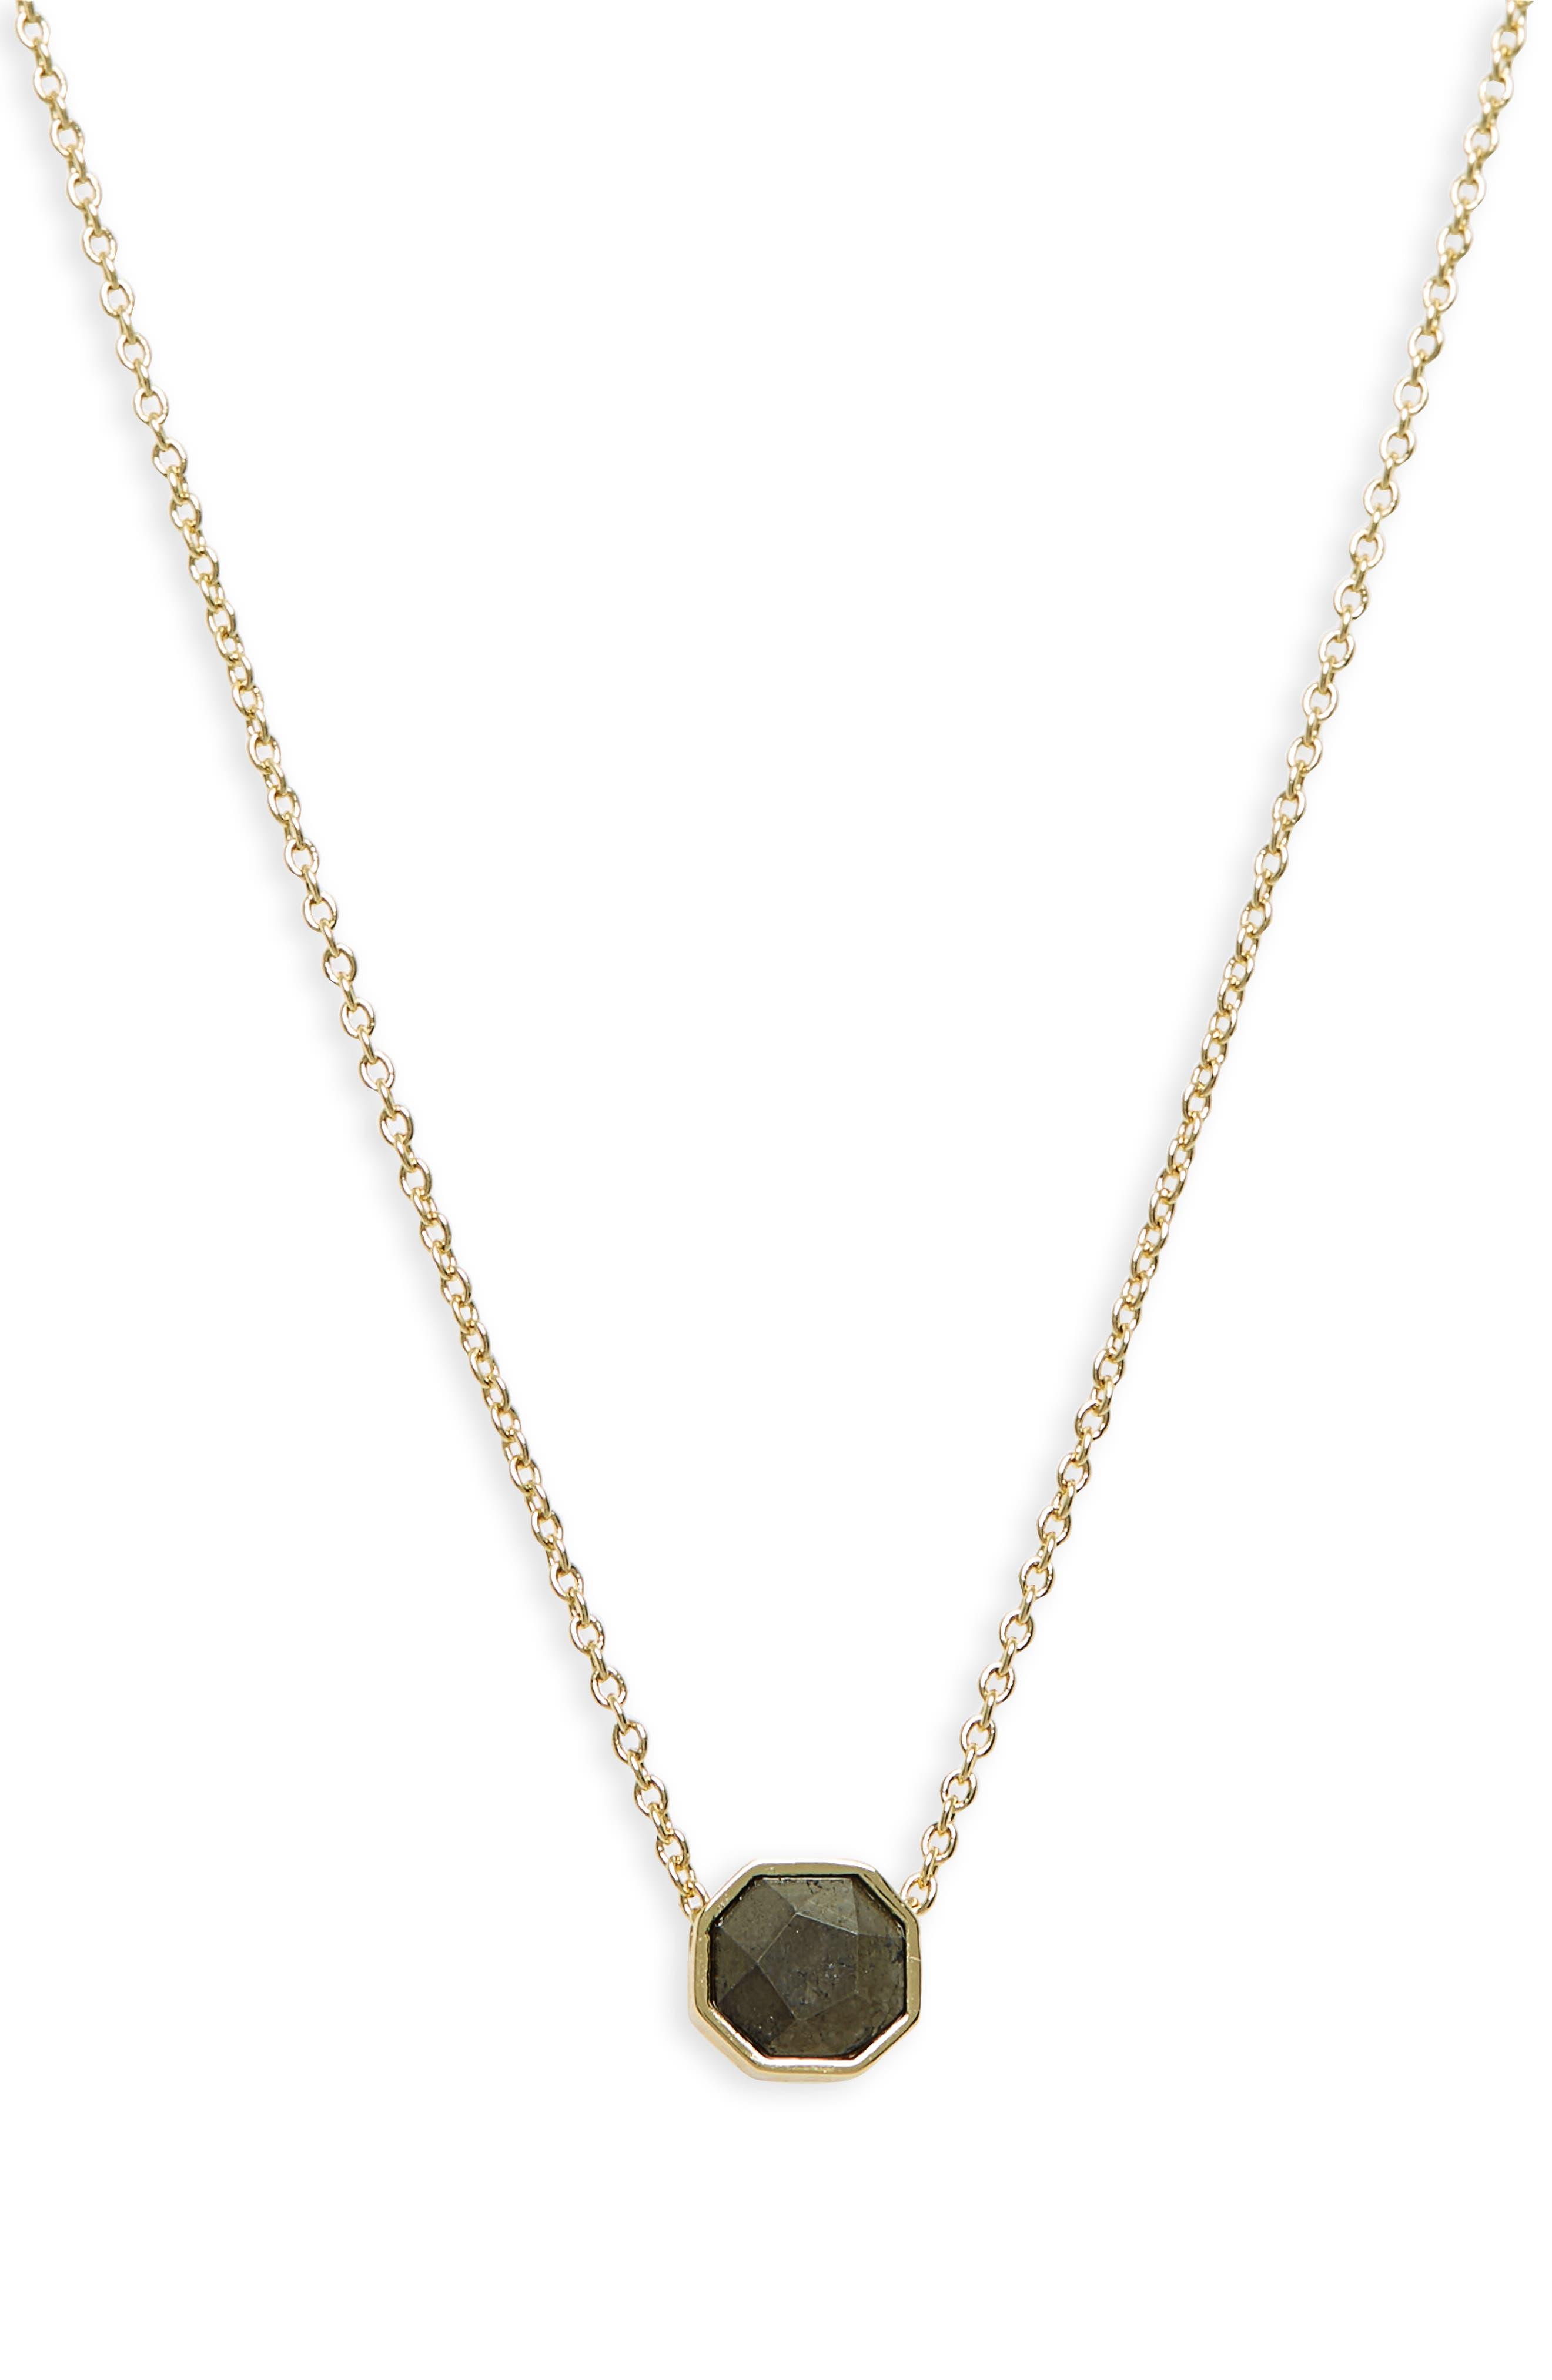 Power Gemstone Charm Adjustable Necklace,                             Alternate thumbnail 2, color,                             PYRITE/ GOLD